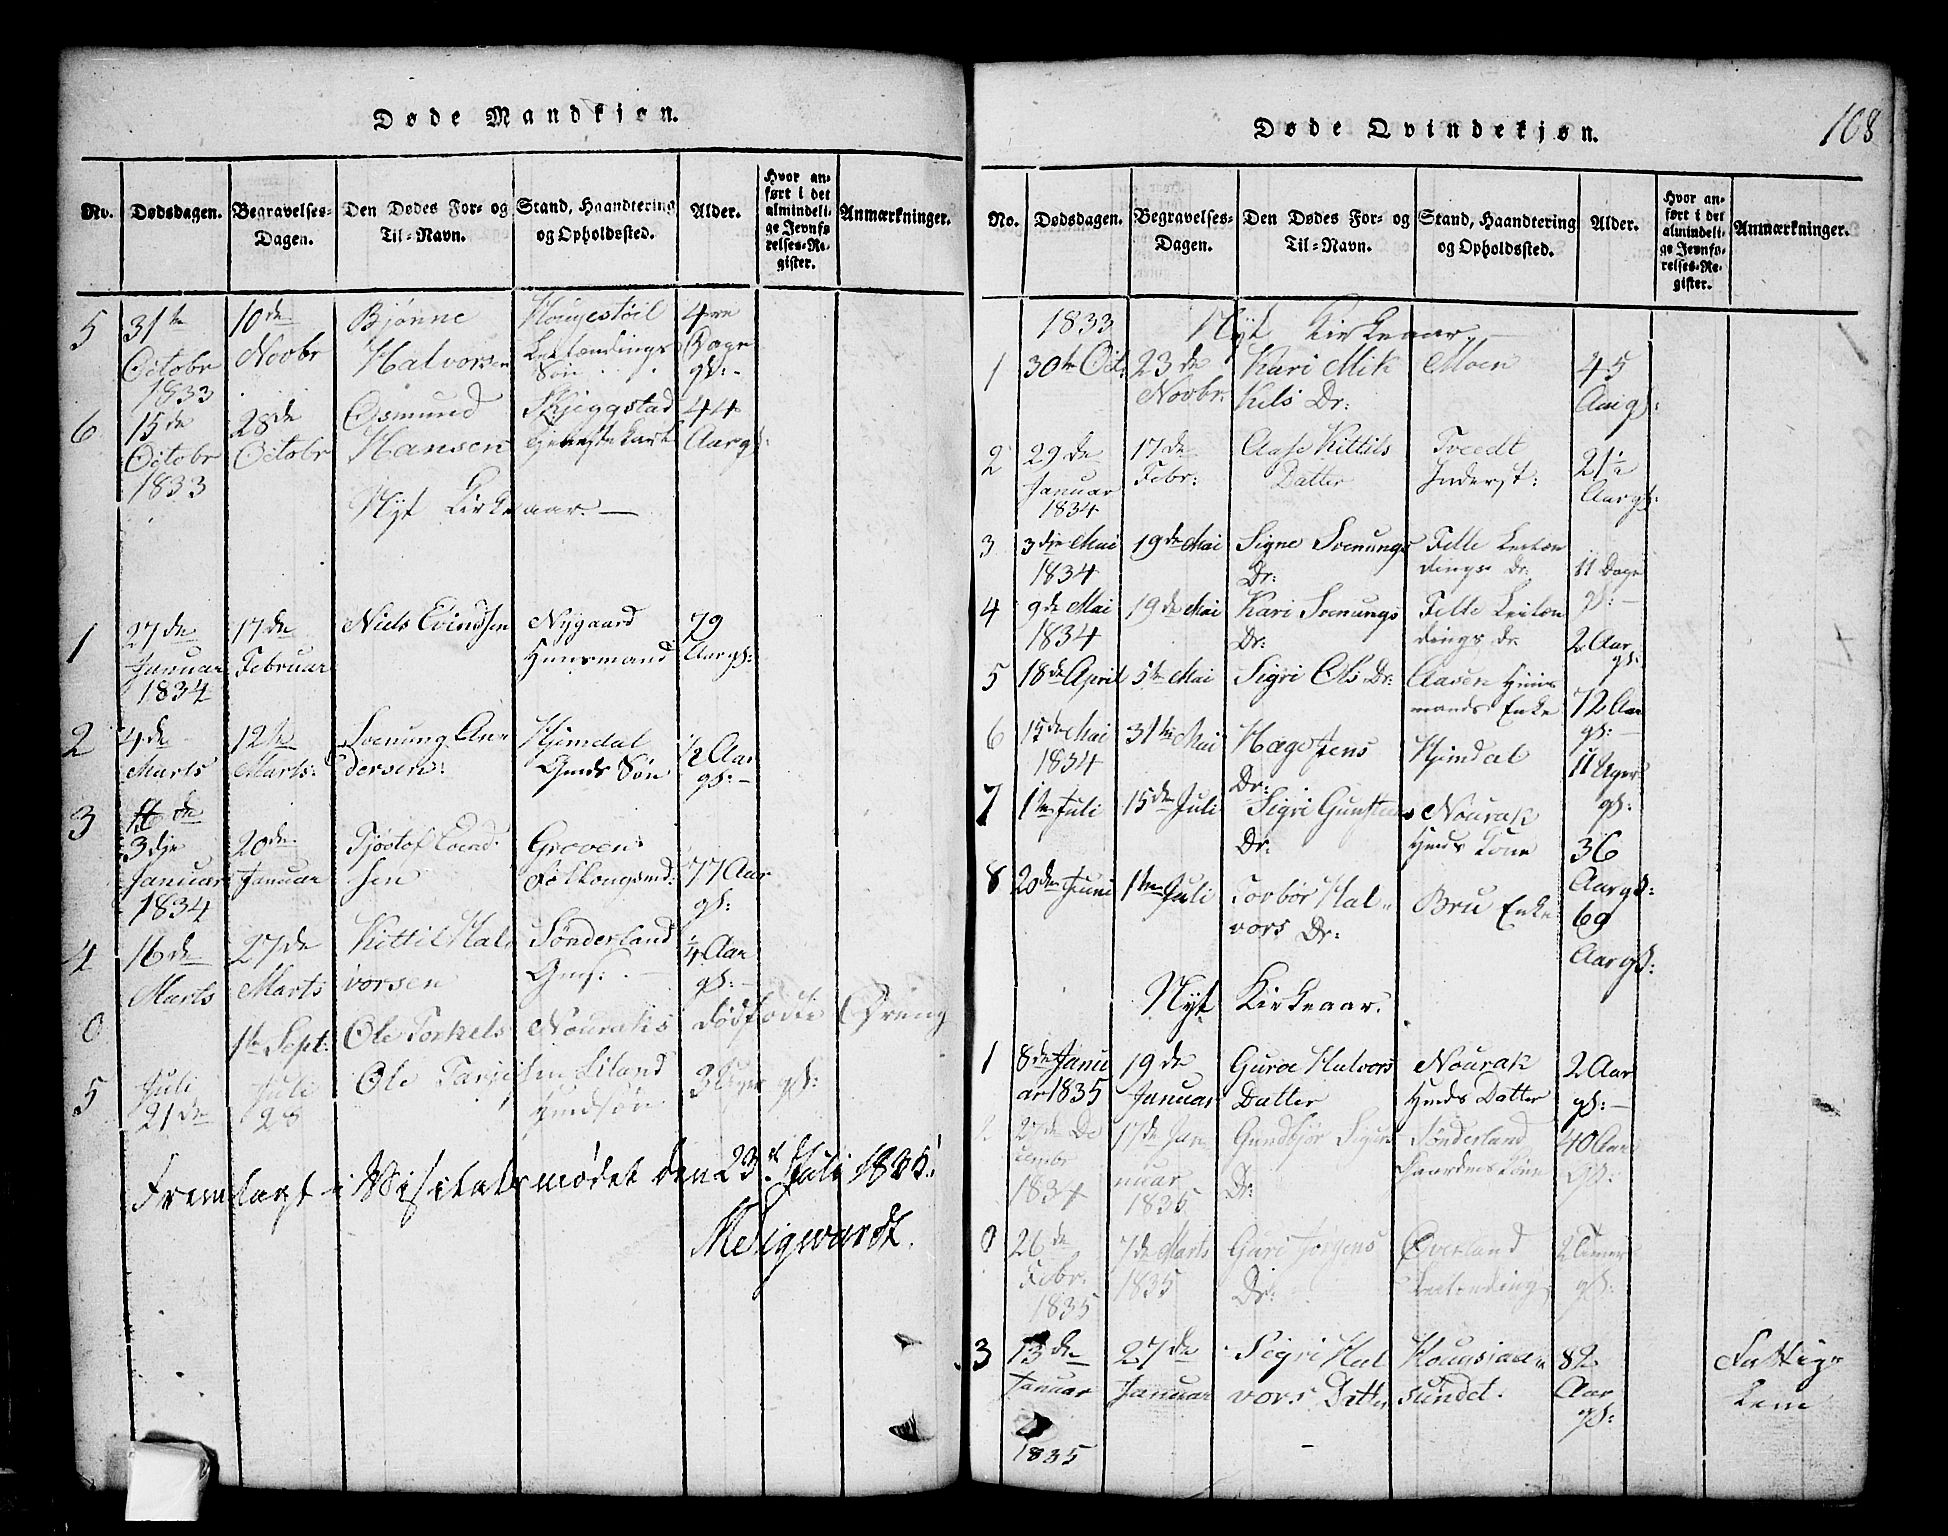 SAKO, Nissedal kirkebøker, G/Gb/L0001: Klokkerbok nr. II 1, 1814-1862, s. 108